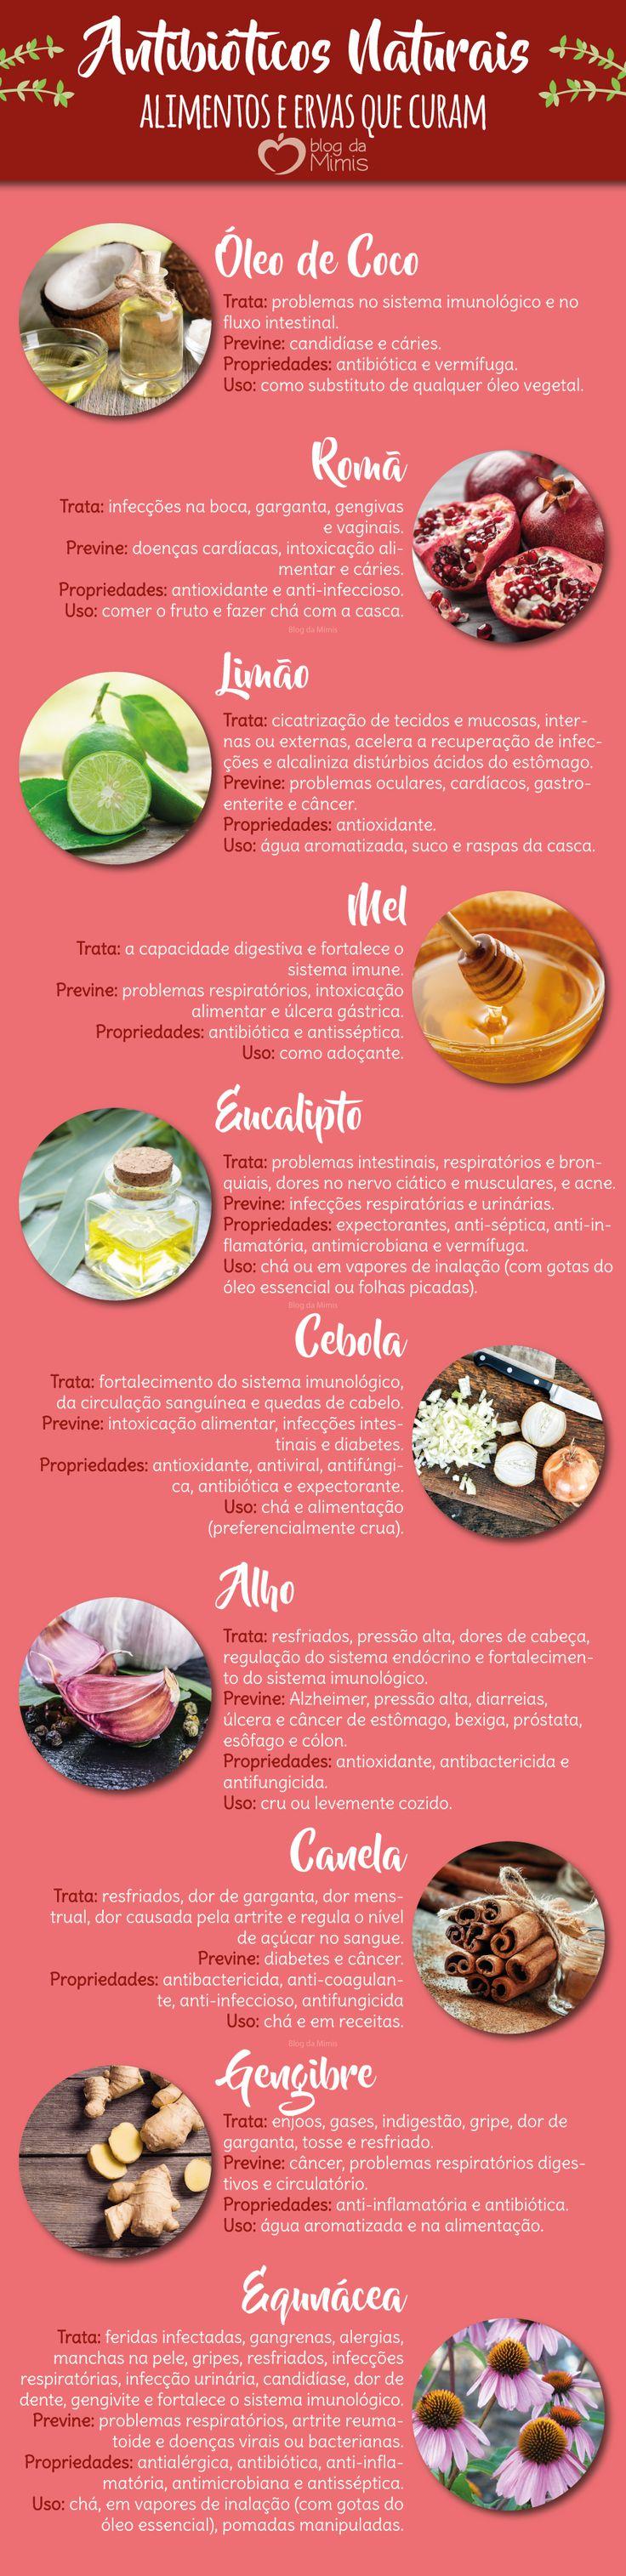 Antibióticos naturais: alimentos e ervas que curam - Blog da Mimis #antibiótico #alimentos #ervas #cura #saudável #natural